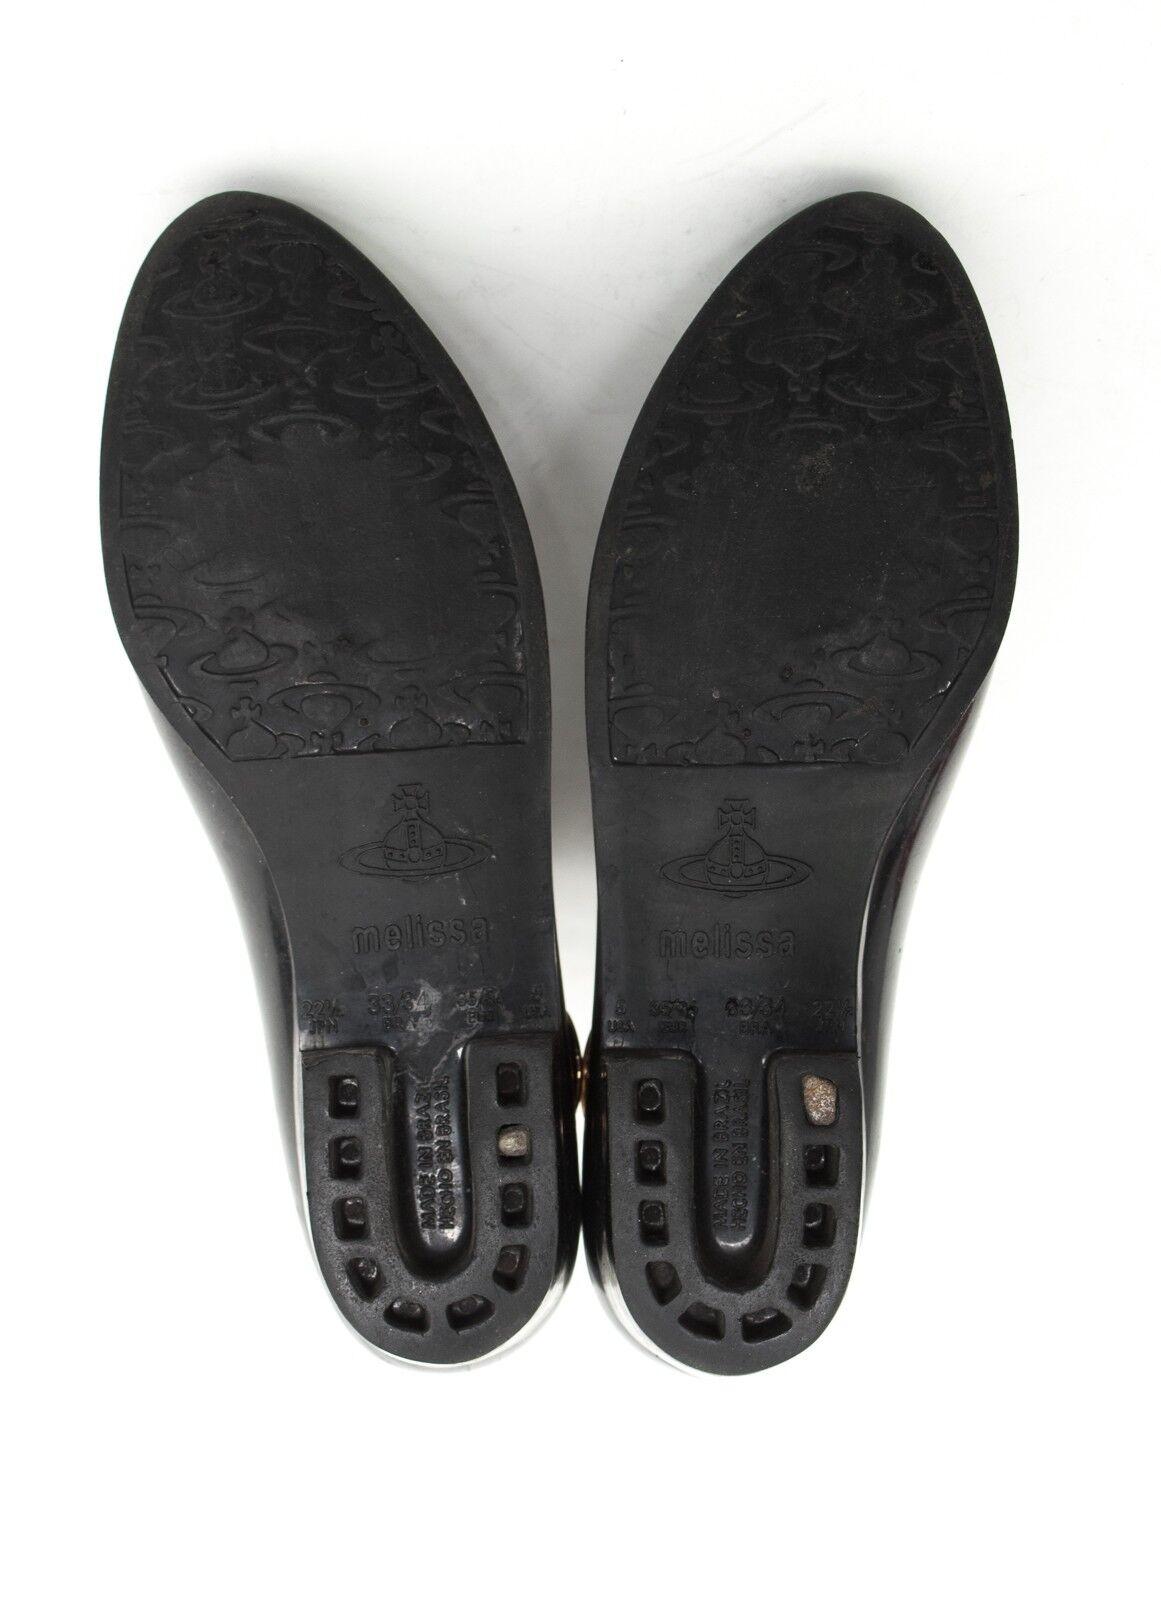 Vivienne Westwood Anglomania + Melissa botines 36 talla 35 36 botines caucho 75cf7c